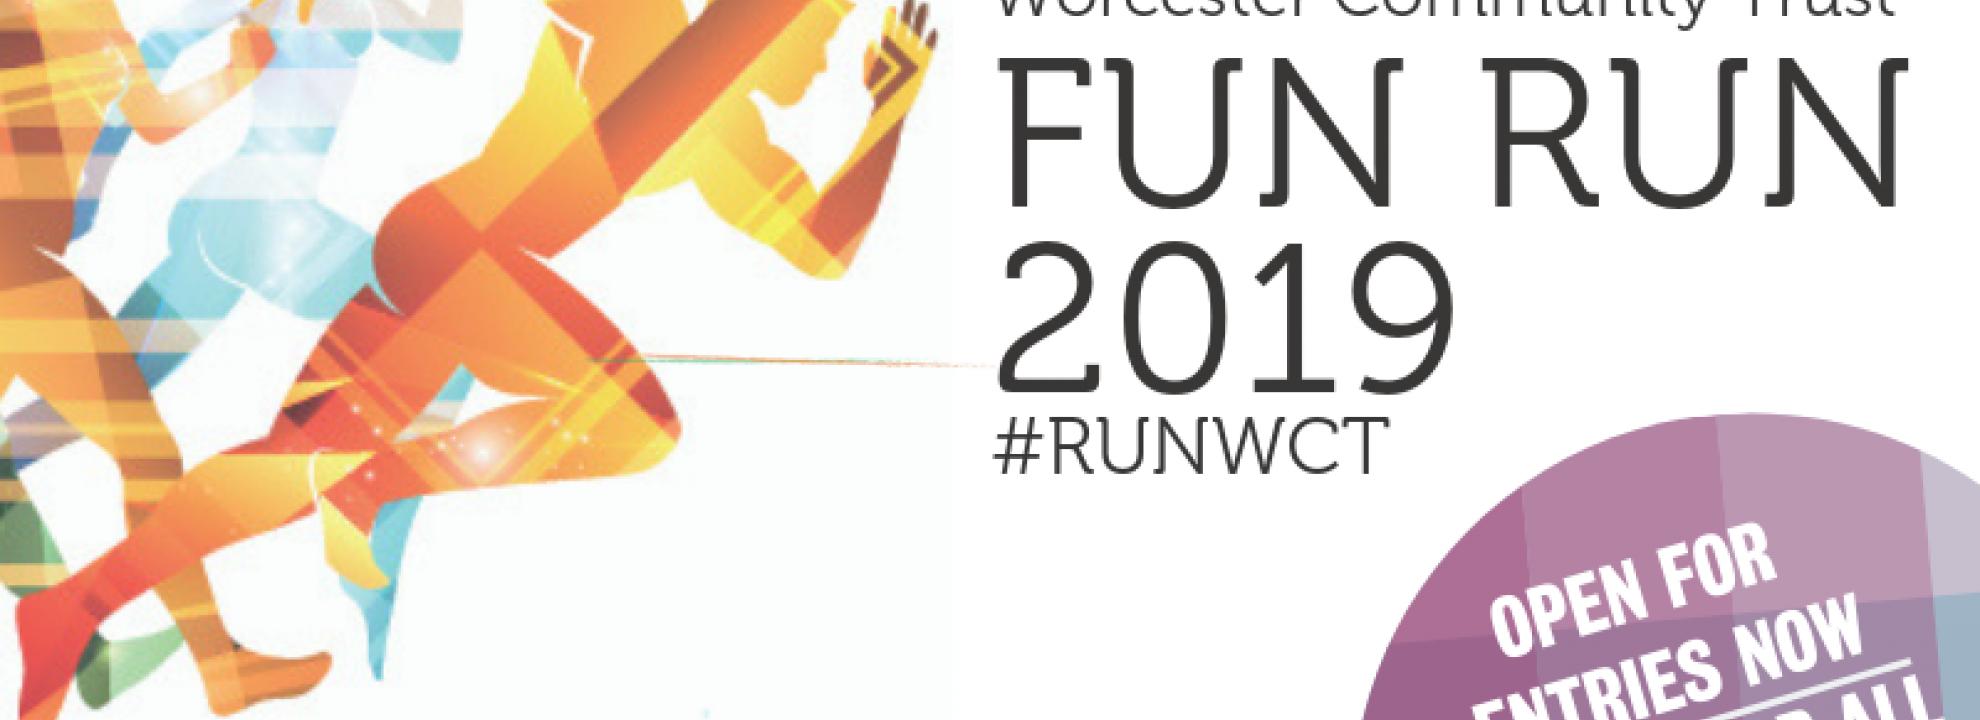 WCT Charity Fun Run Banner